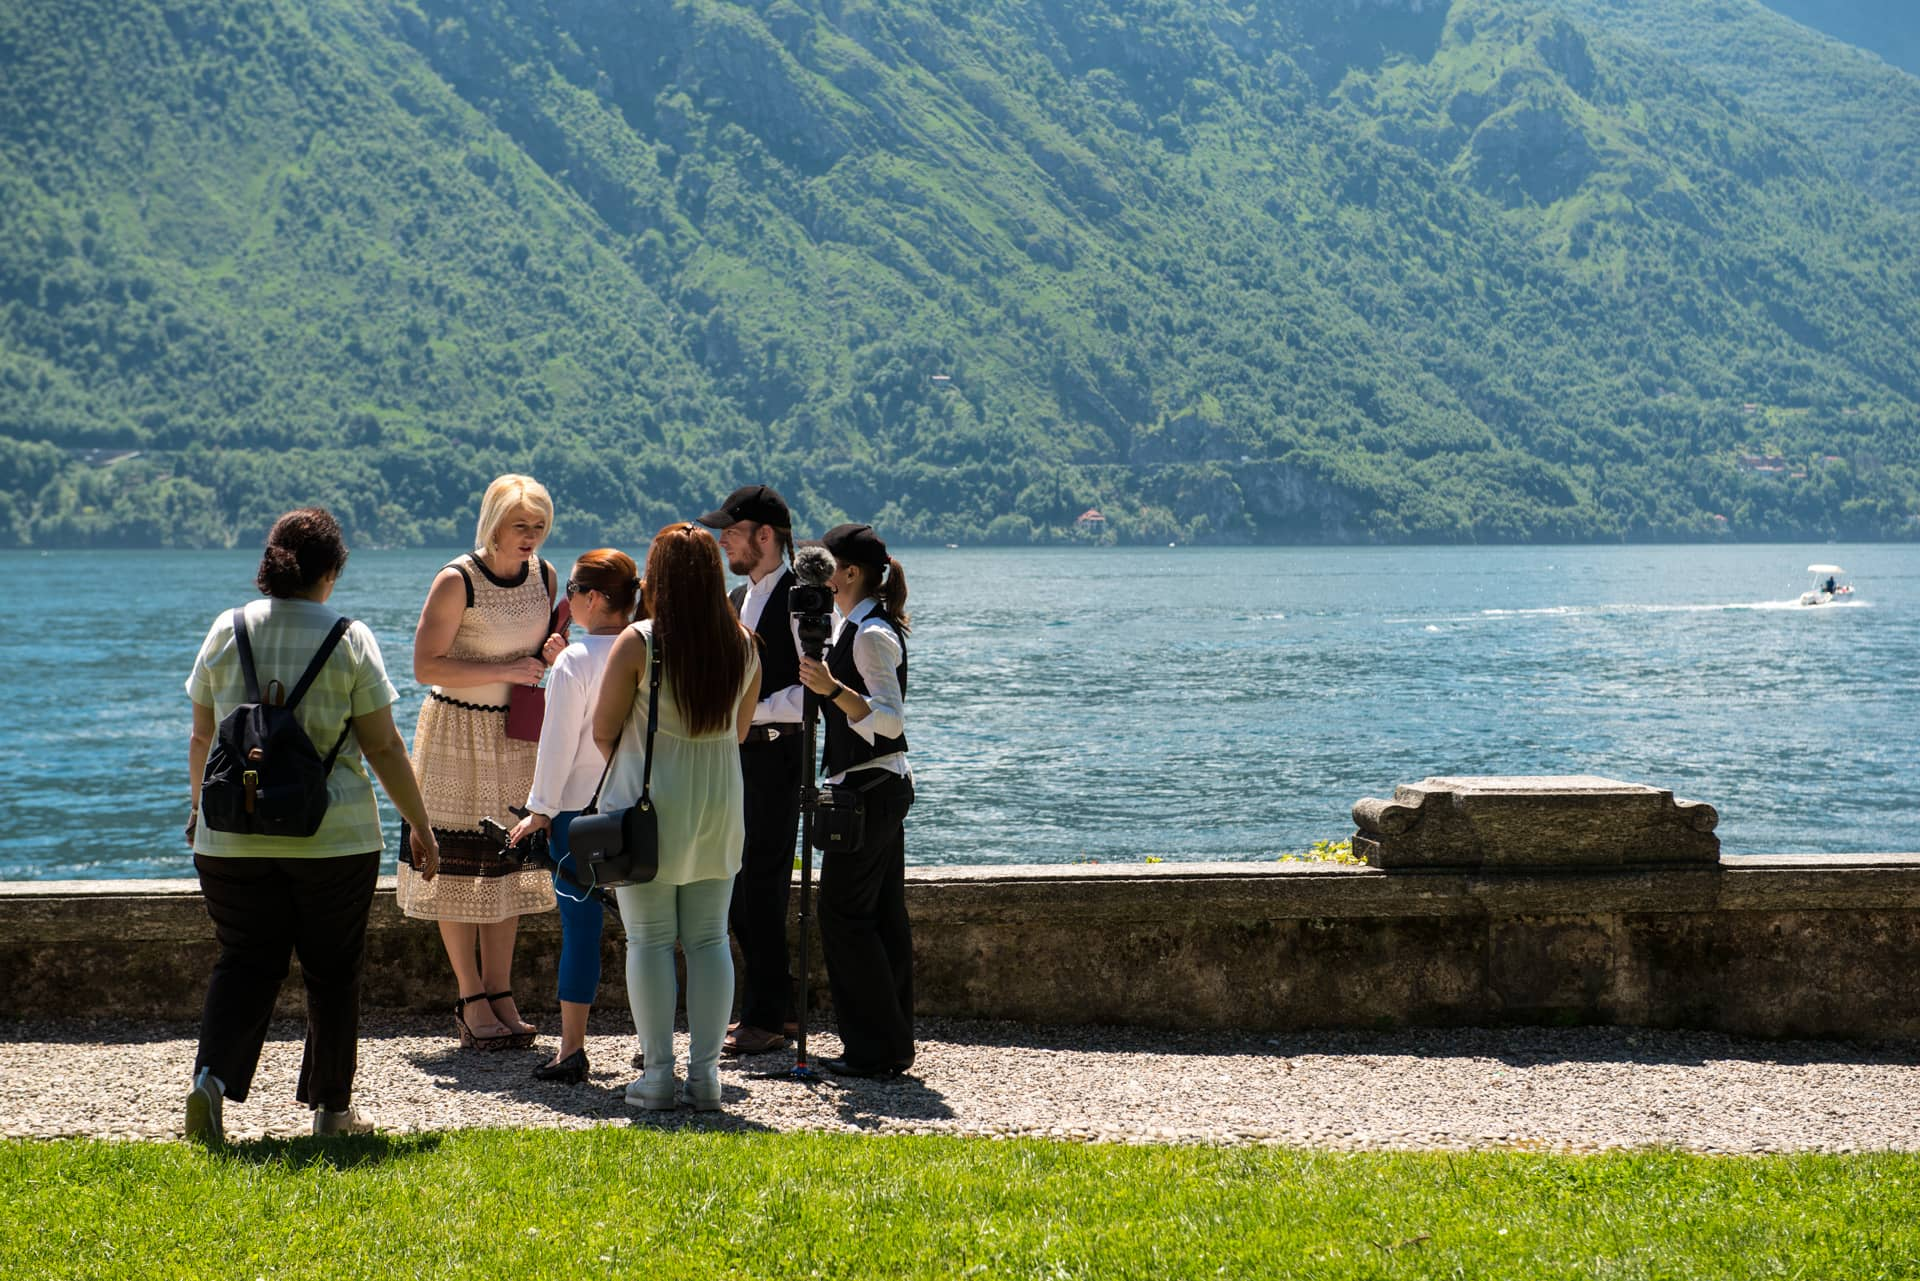 Vilma Wedding&Event Planner_vestuvių organizavimas_vestuvių organizatorė Italijoje_Vilma Rapšaitė_darbas su komanda_vestuvių organizatorės komanda